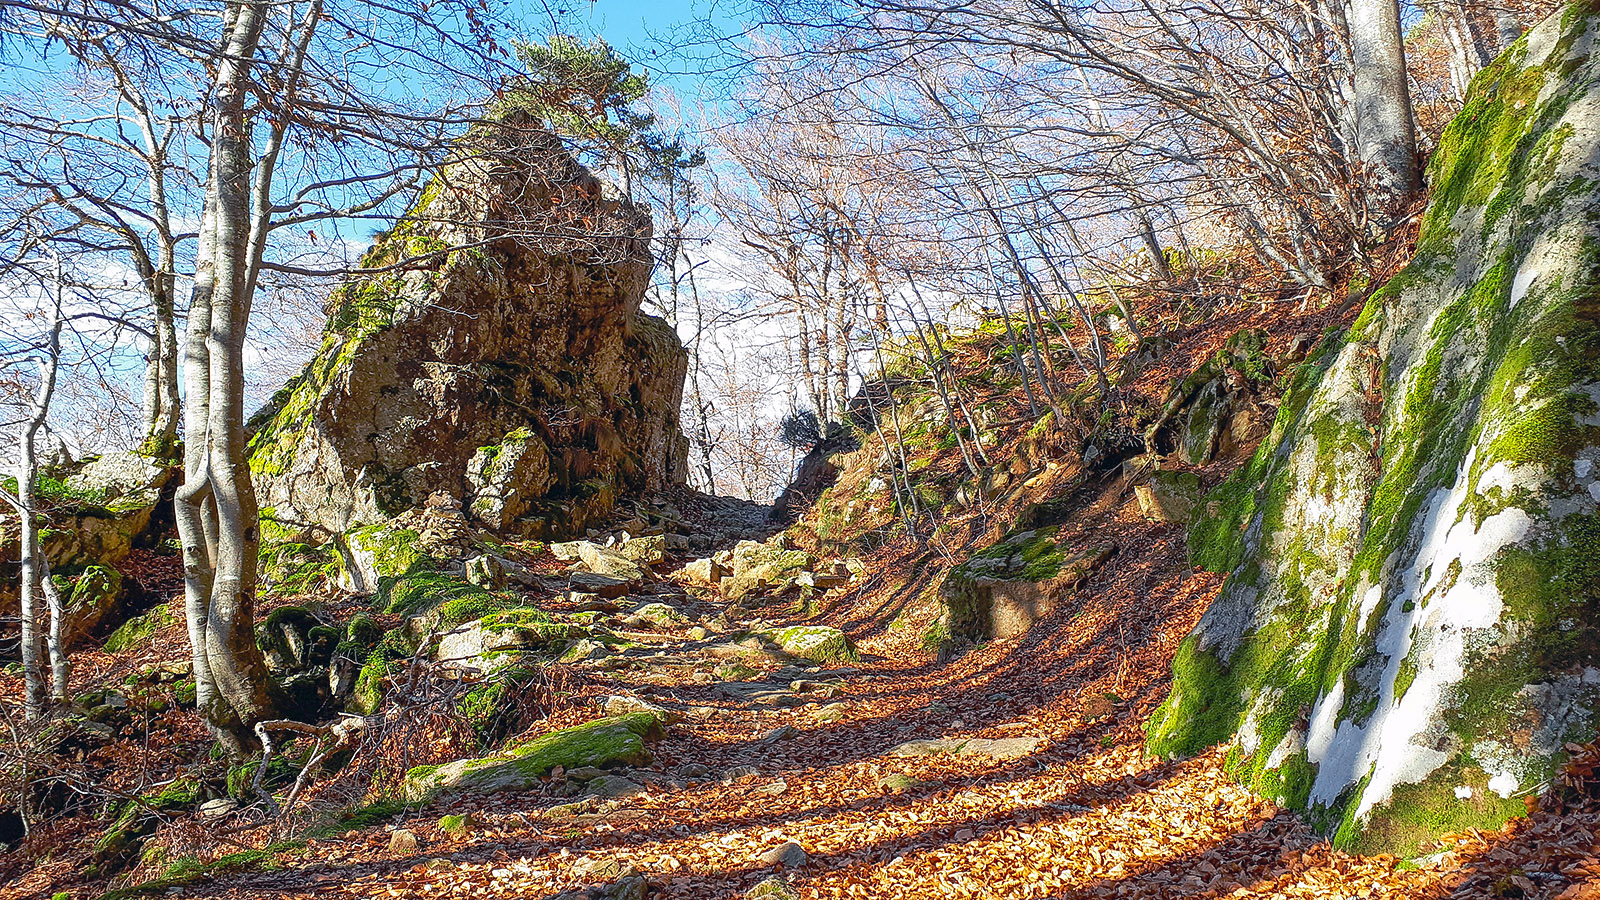 Wanderweg in der Auvergne. Foto: Maria-Theresia Riedl.